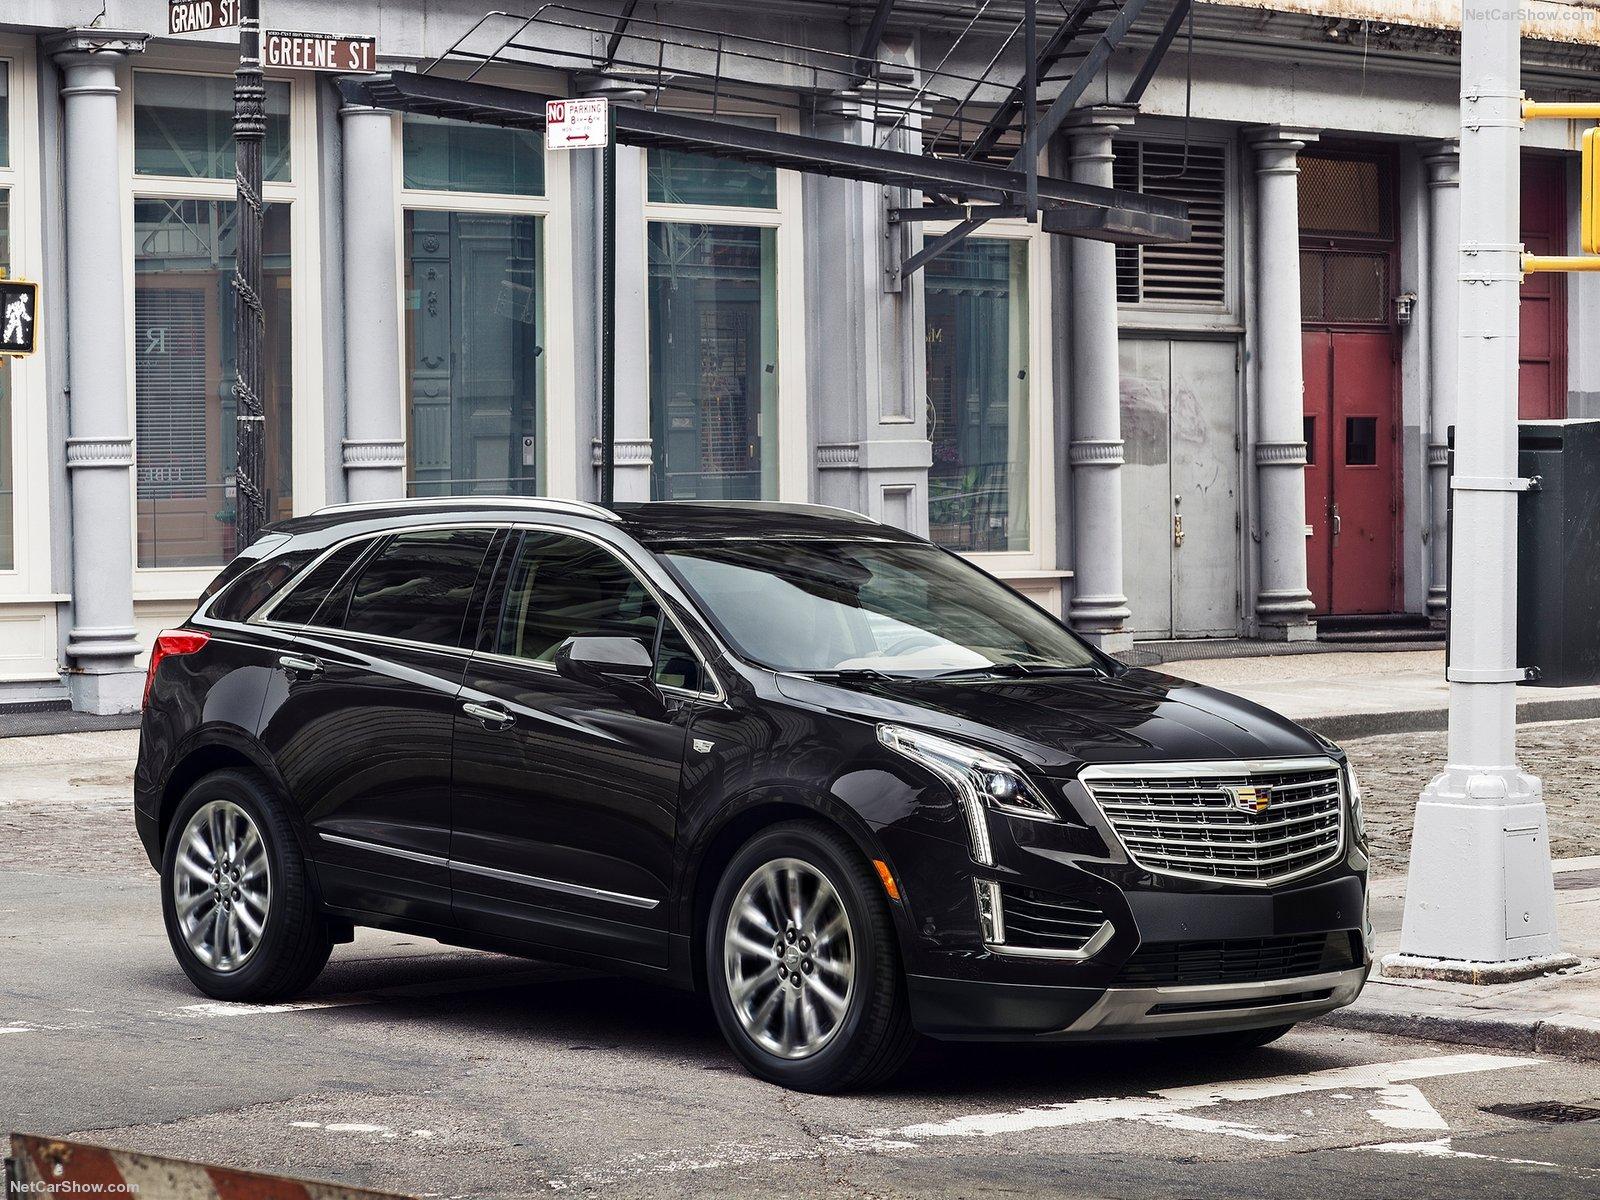 Cadillac-XT5_2017_1600x1200_wallpaper_06